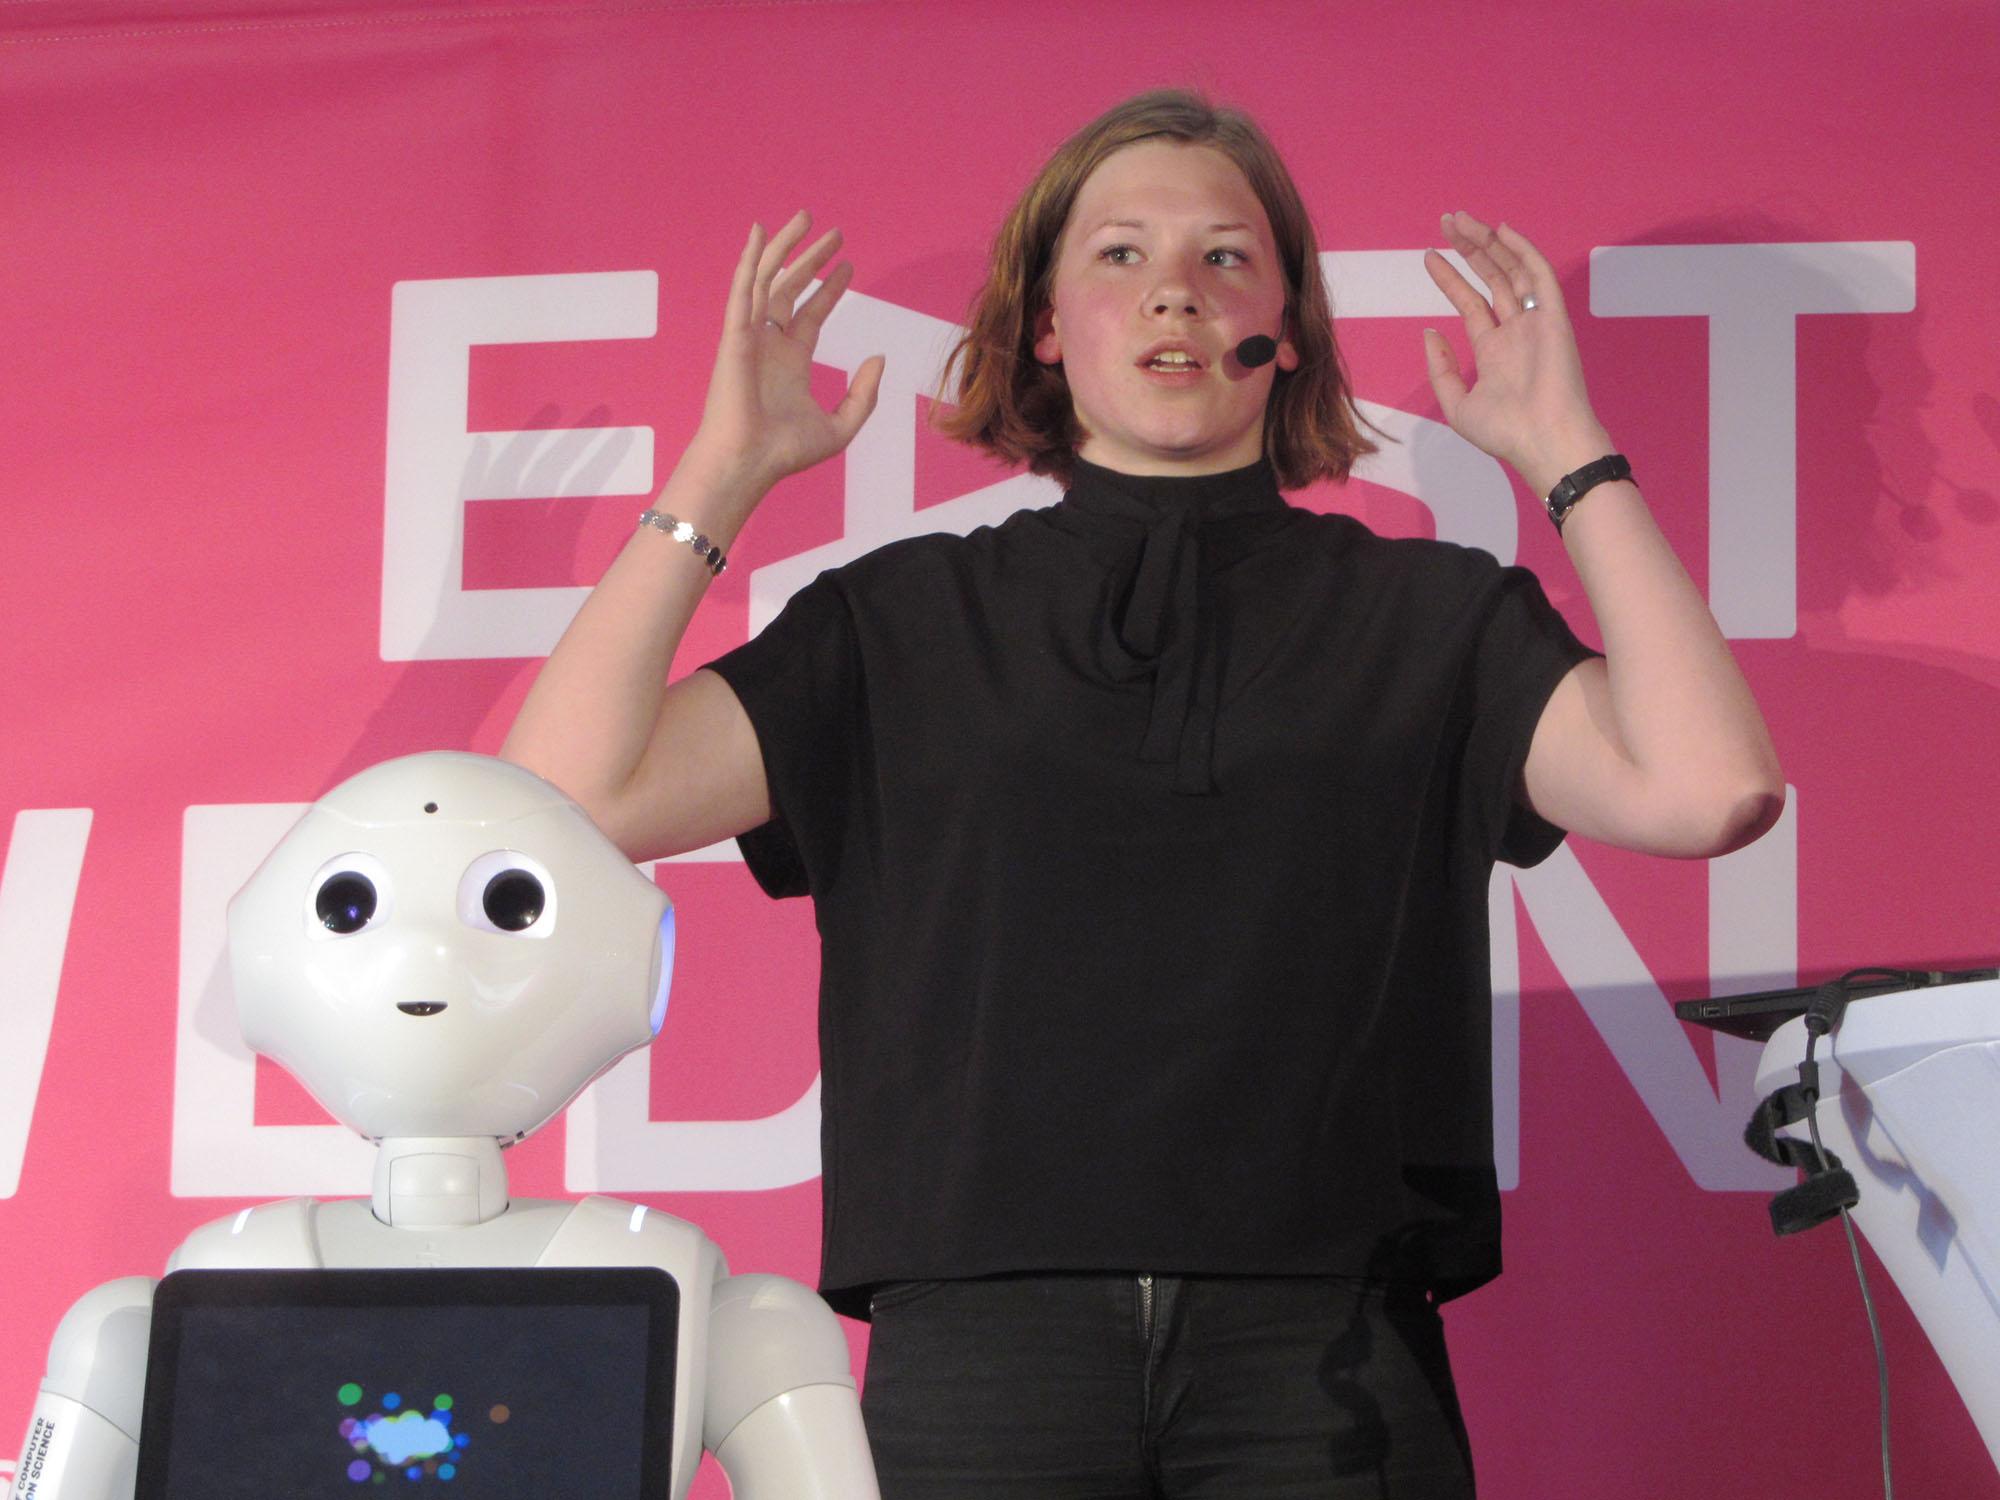 Robotkänslor i Almedalen - Linköpings universitet f517ddff78829